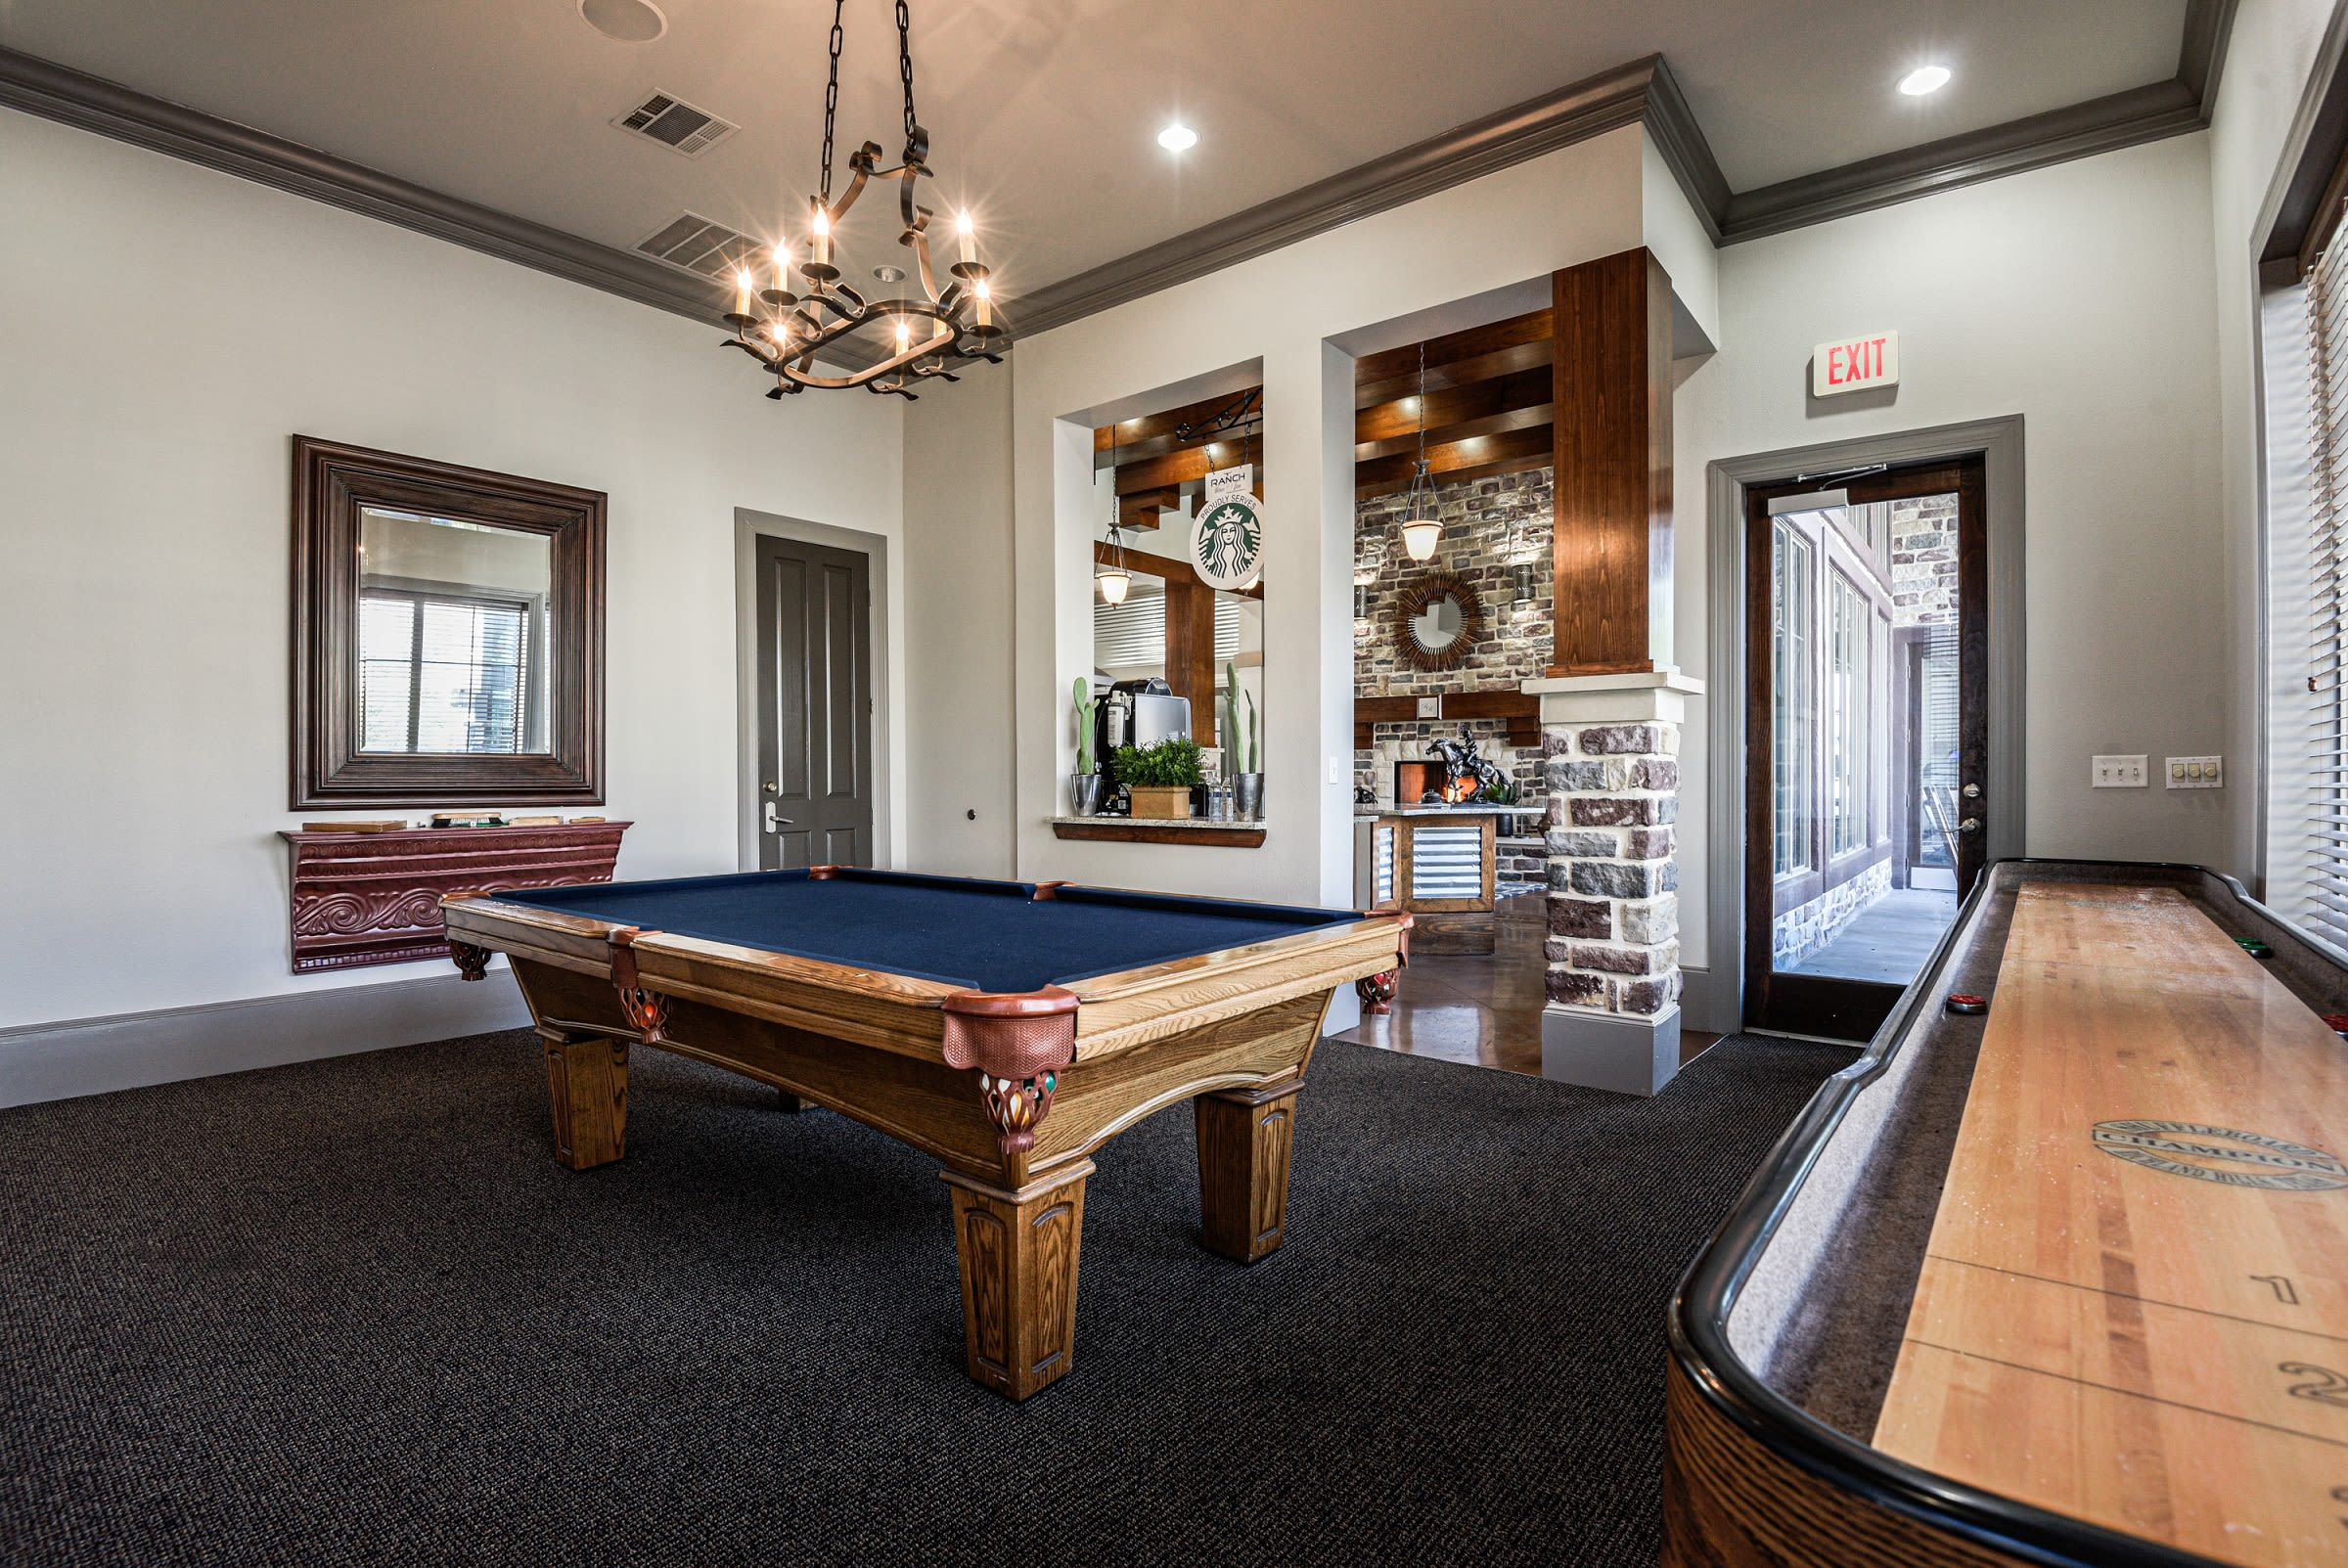 Pool table and shuffleboard tables available at Ranch ThreeOFive in Arlington, Texas